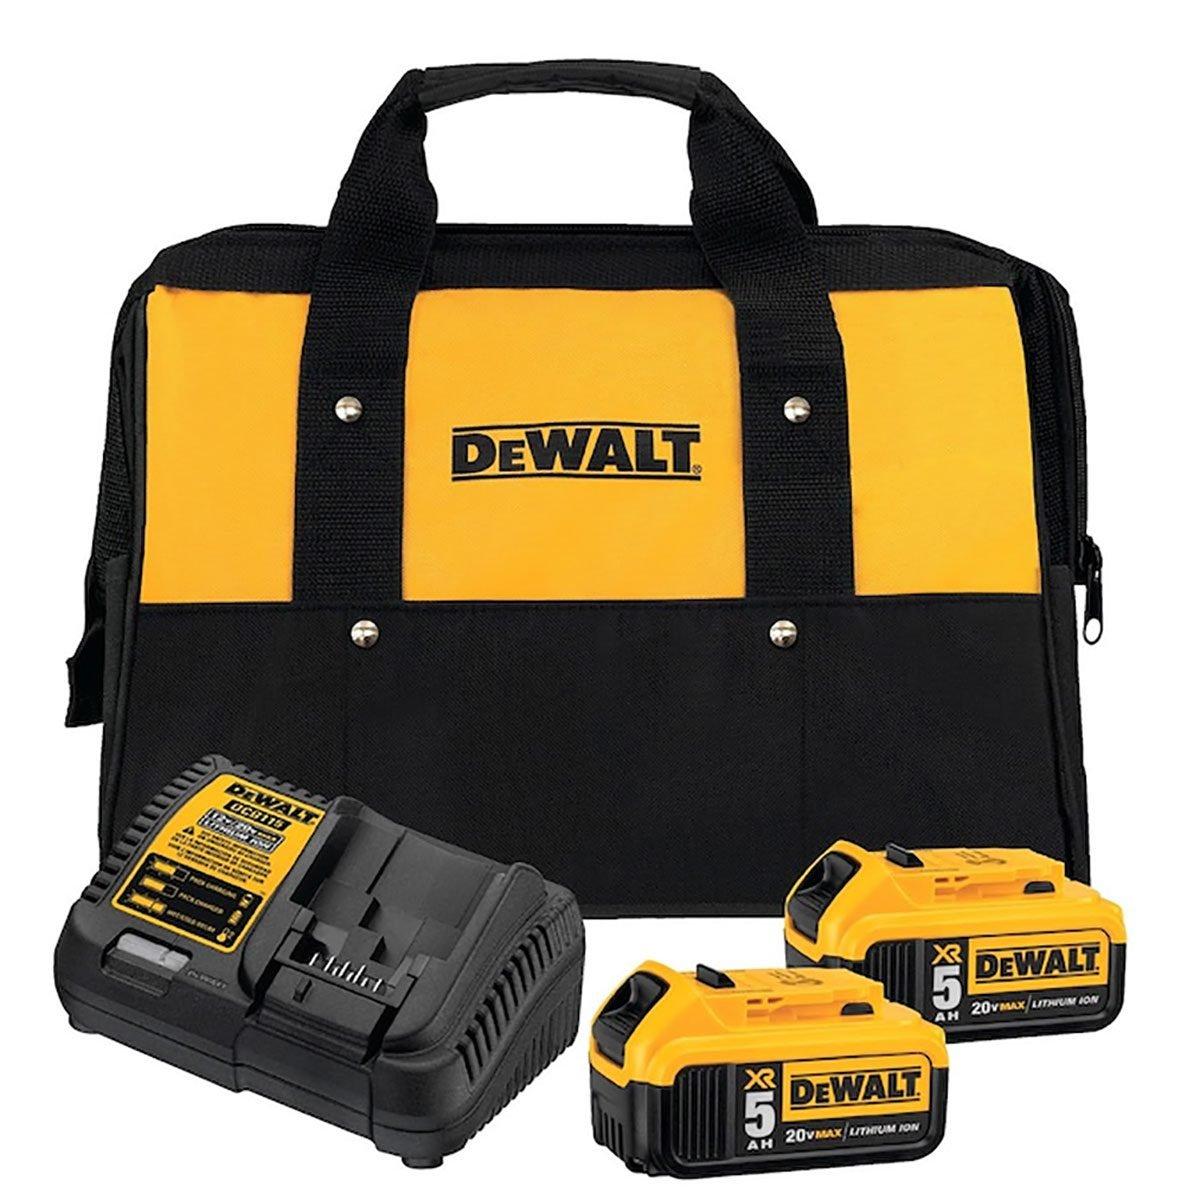 dewalt battery kit